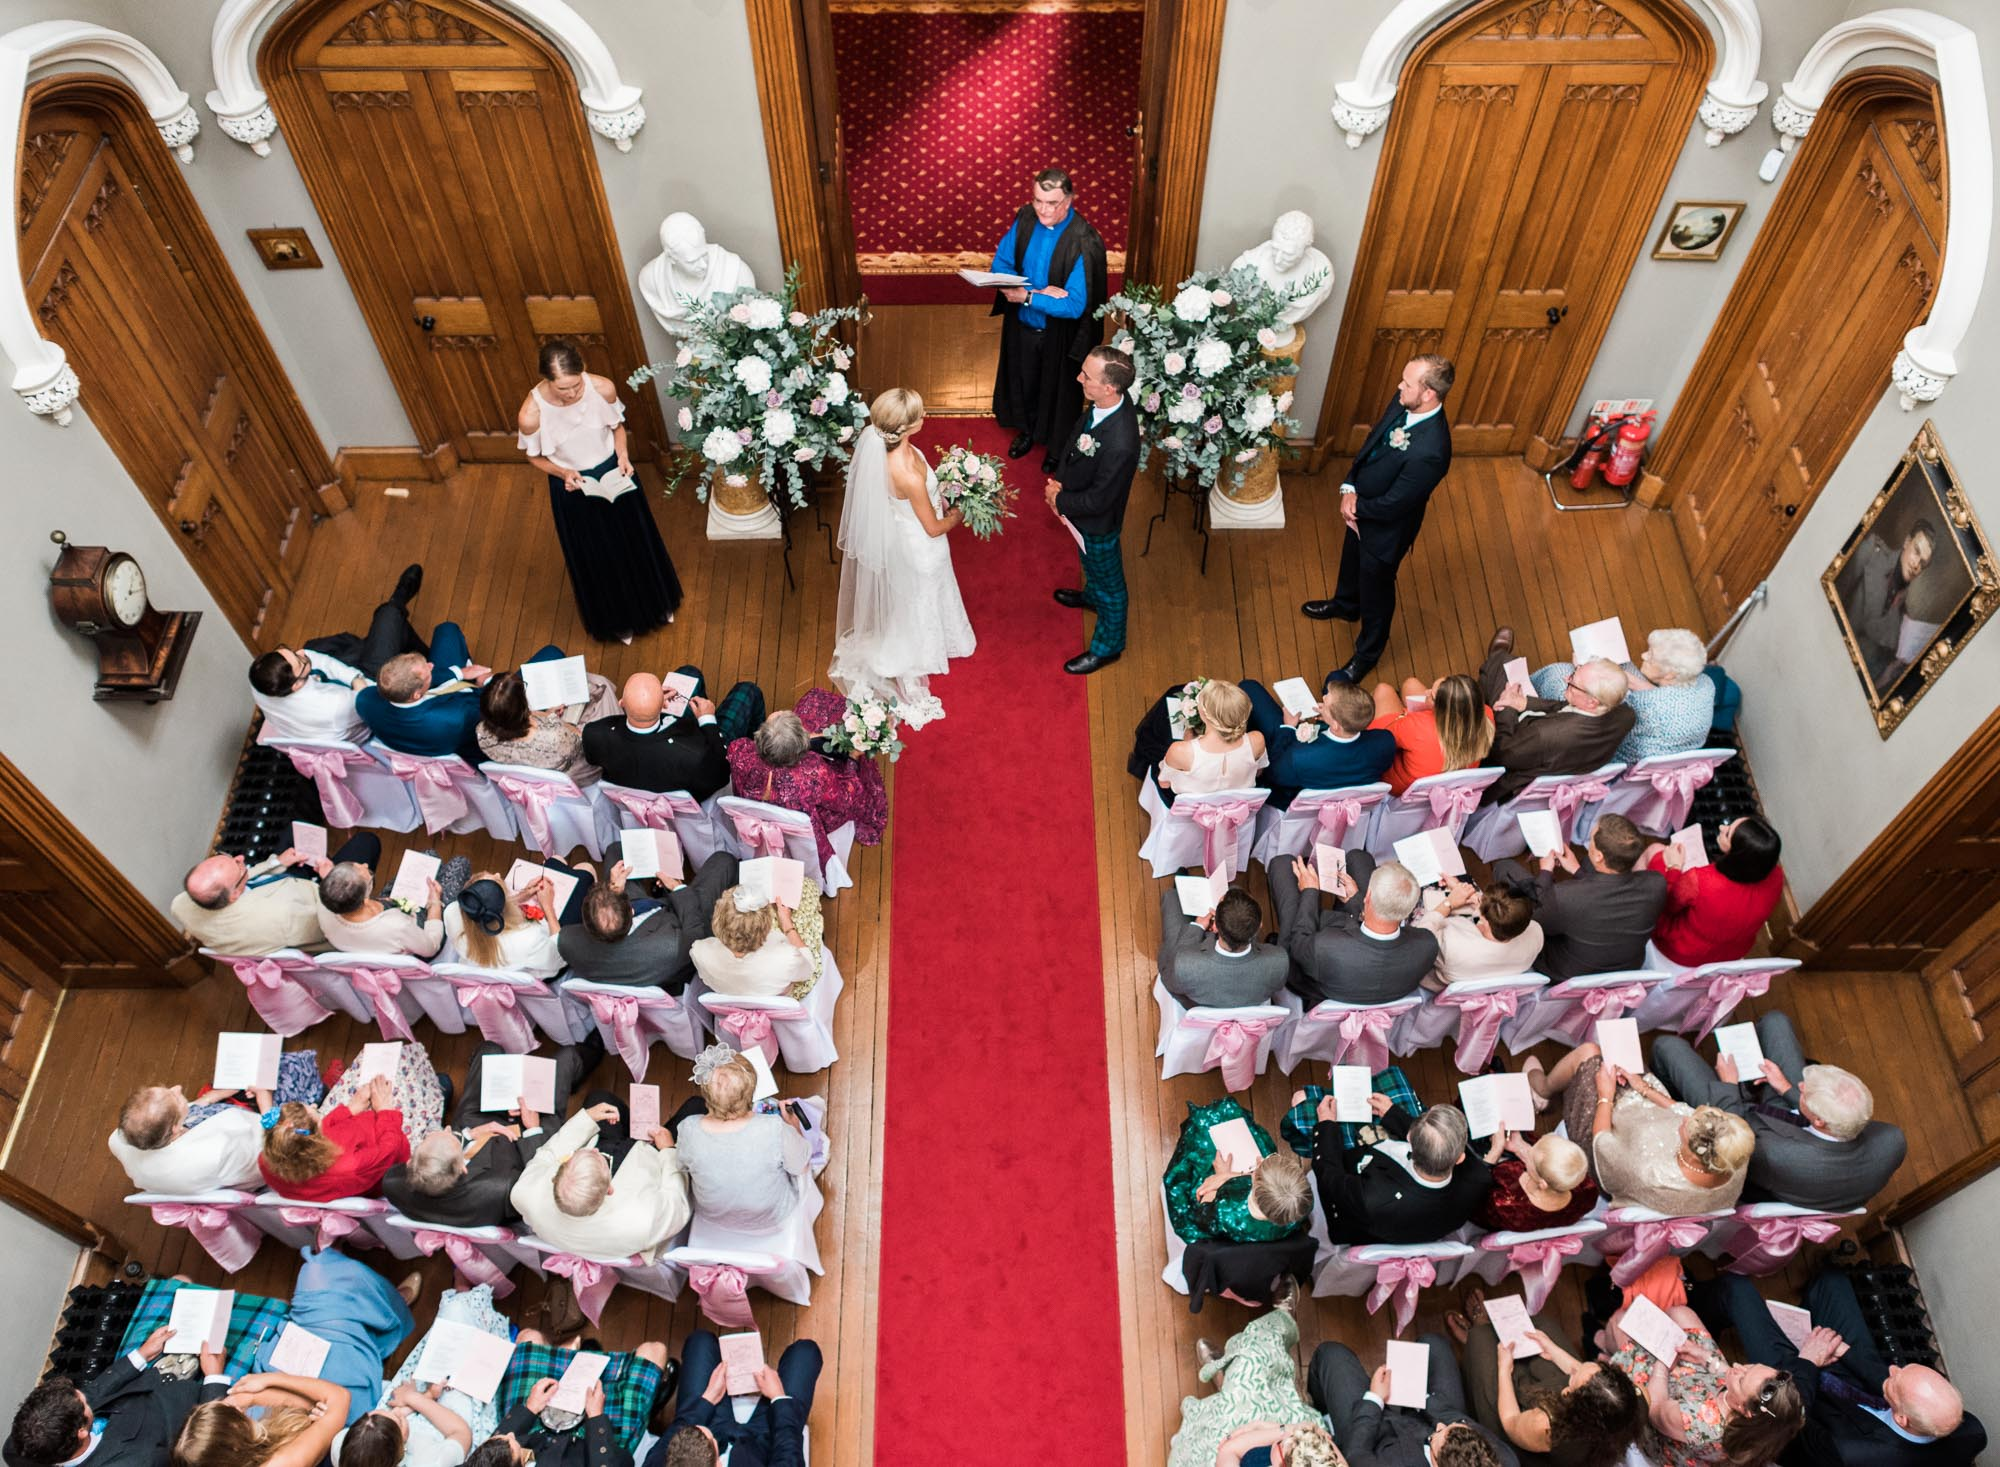 scottish_wedding_blairquhan_castle-67.jpg